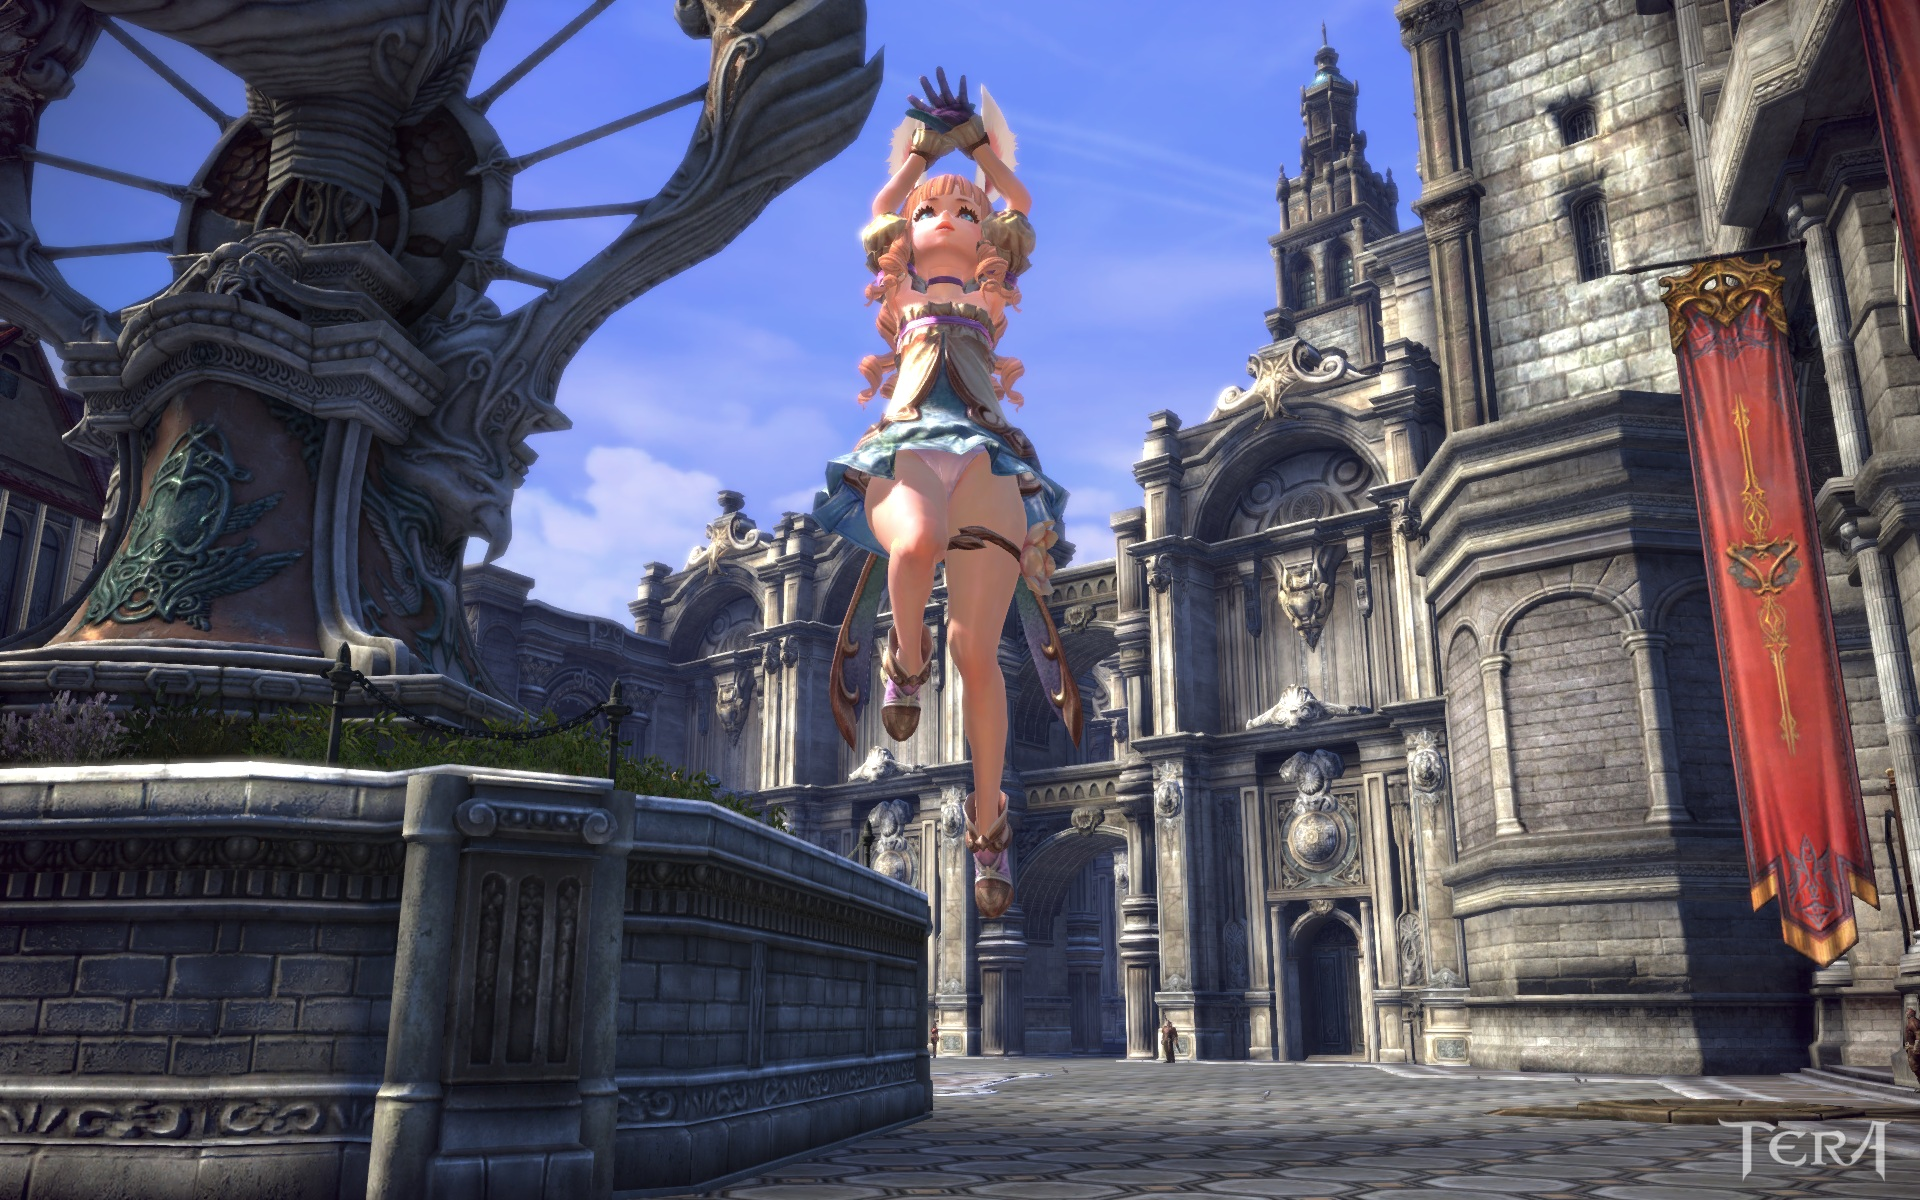 mistral games carried praetor secret recent accomplishment thread tera